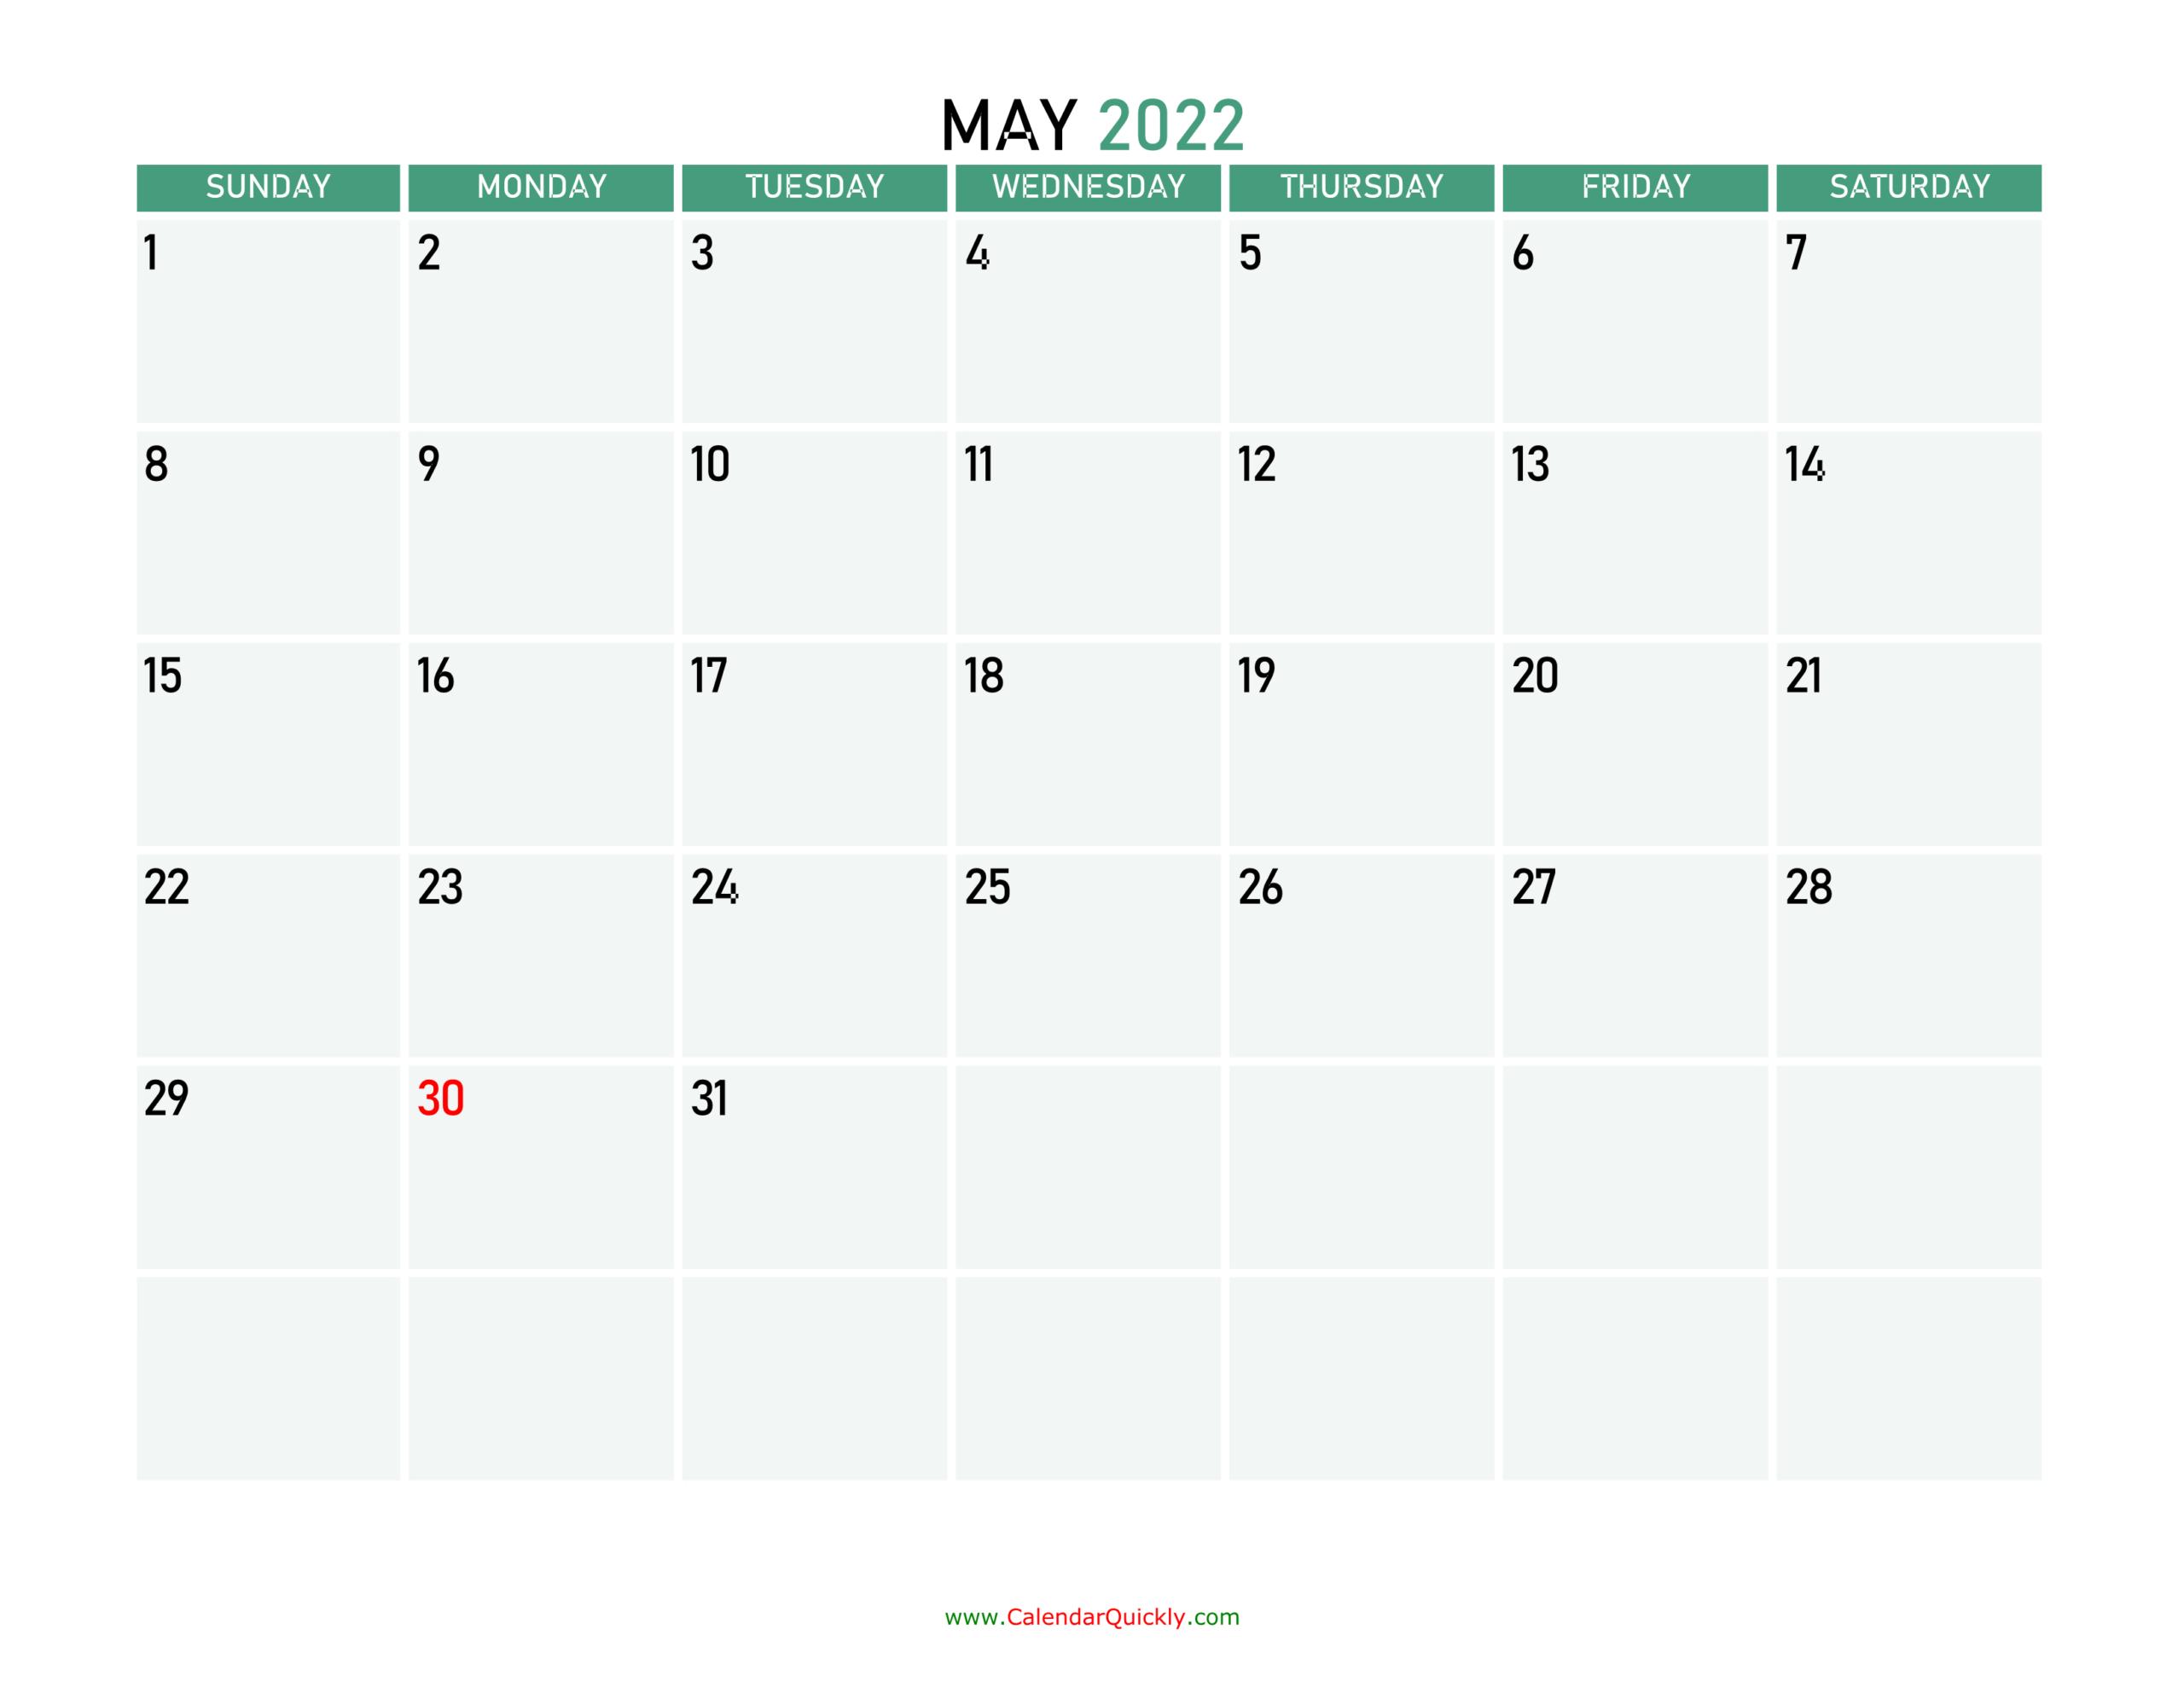 May 2022 Printable Calendar | Calendar Quickly intended for Printable Calendar May 2022